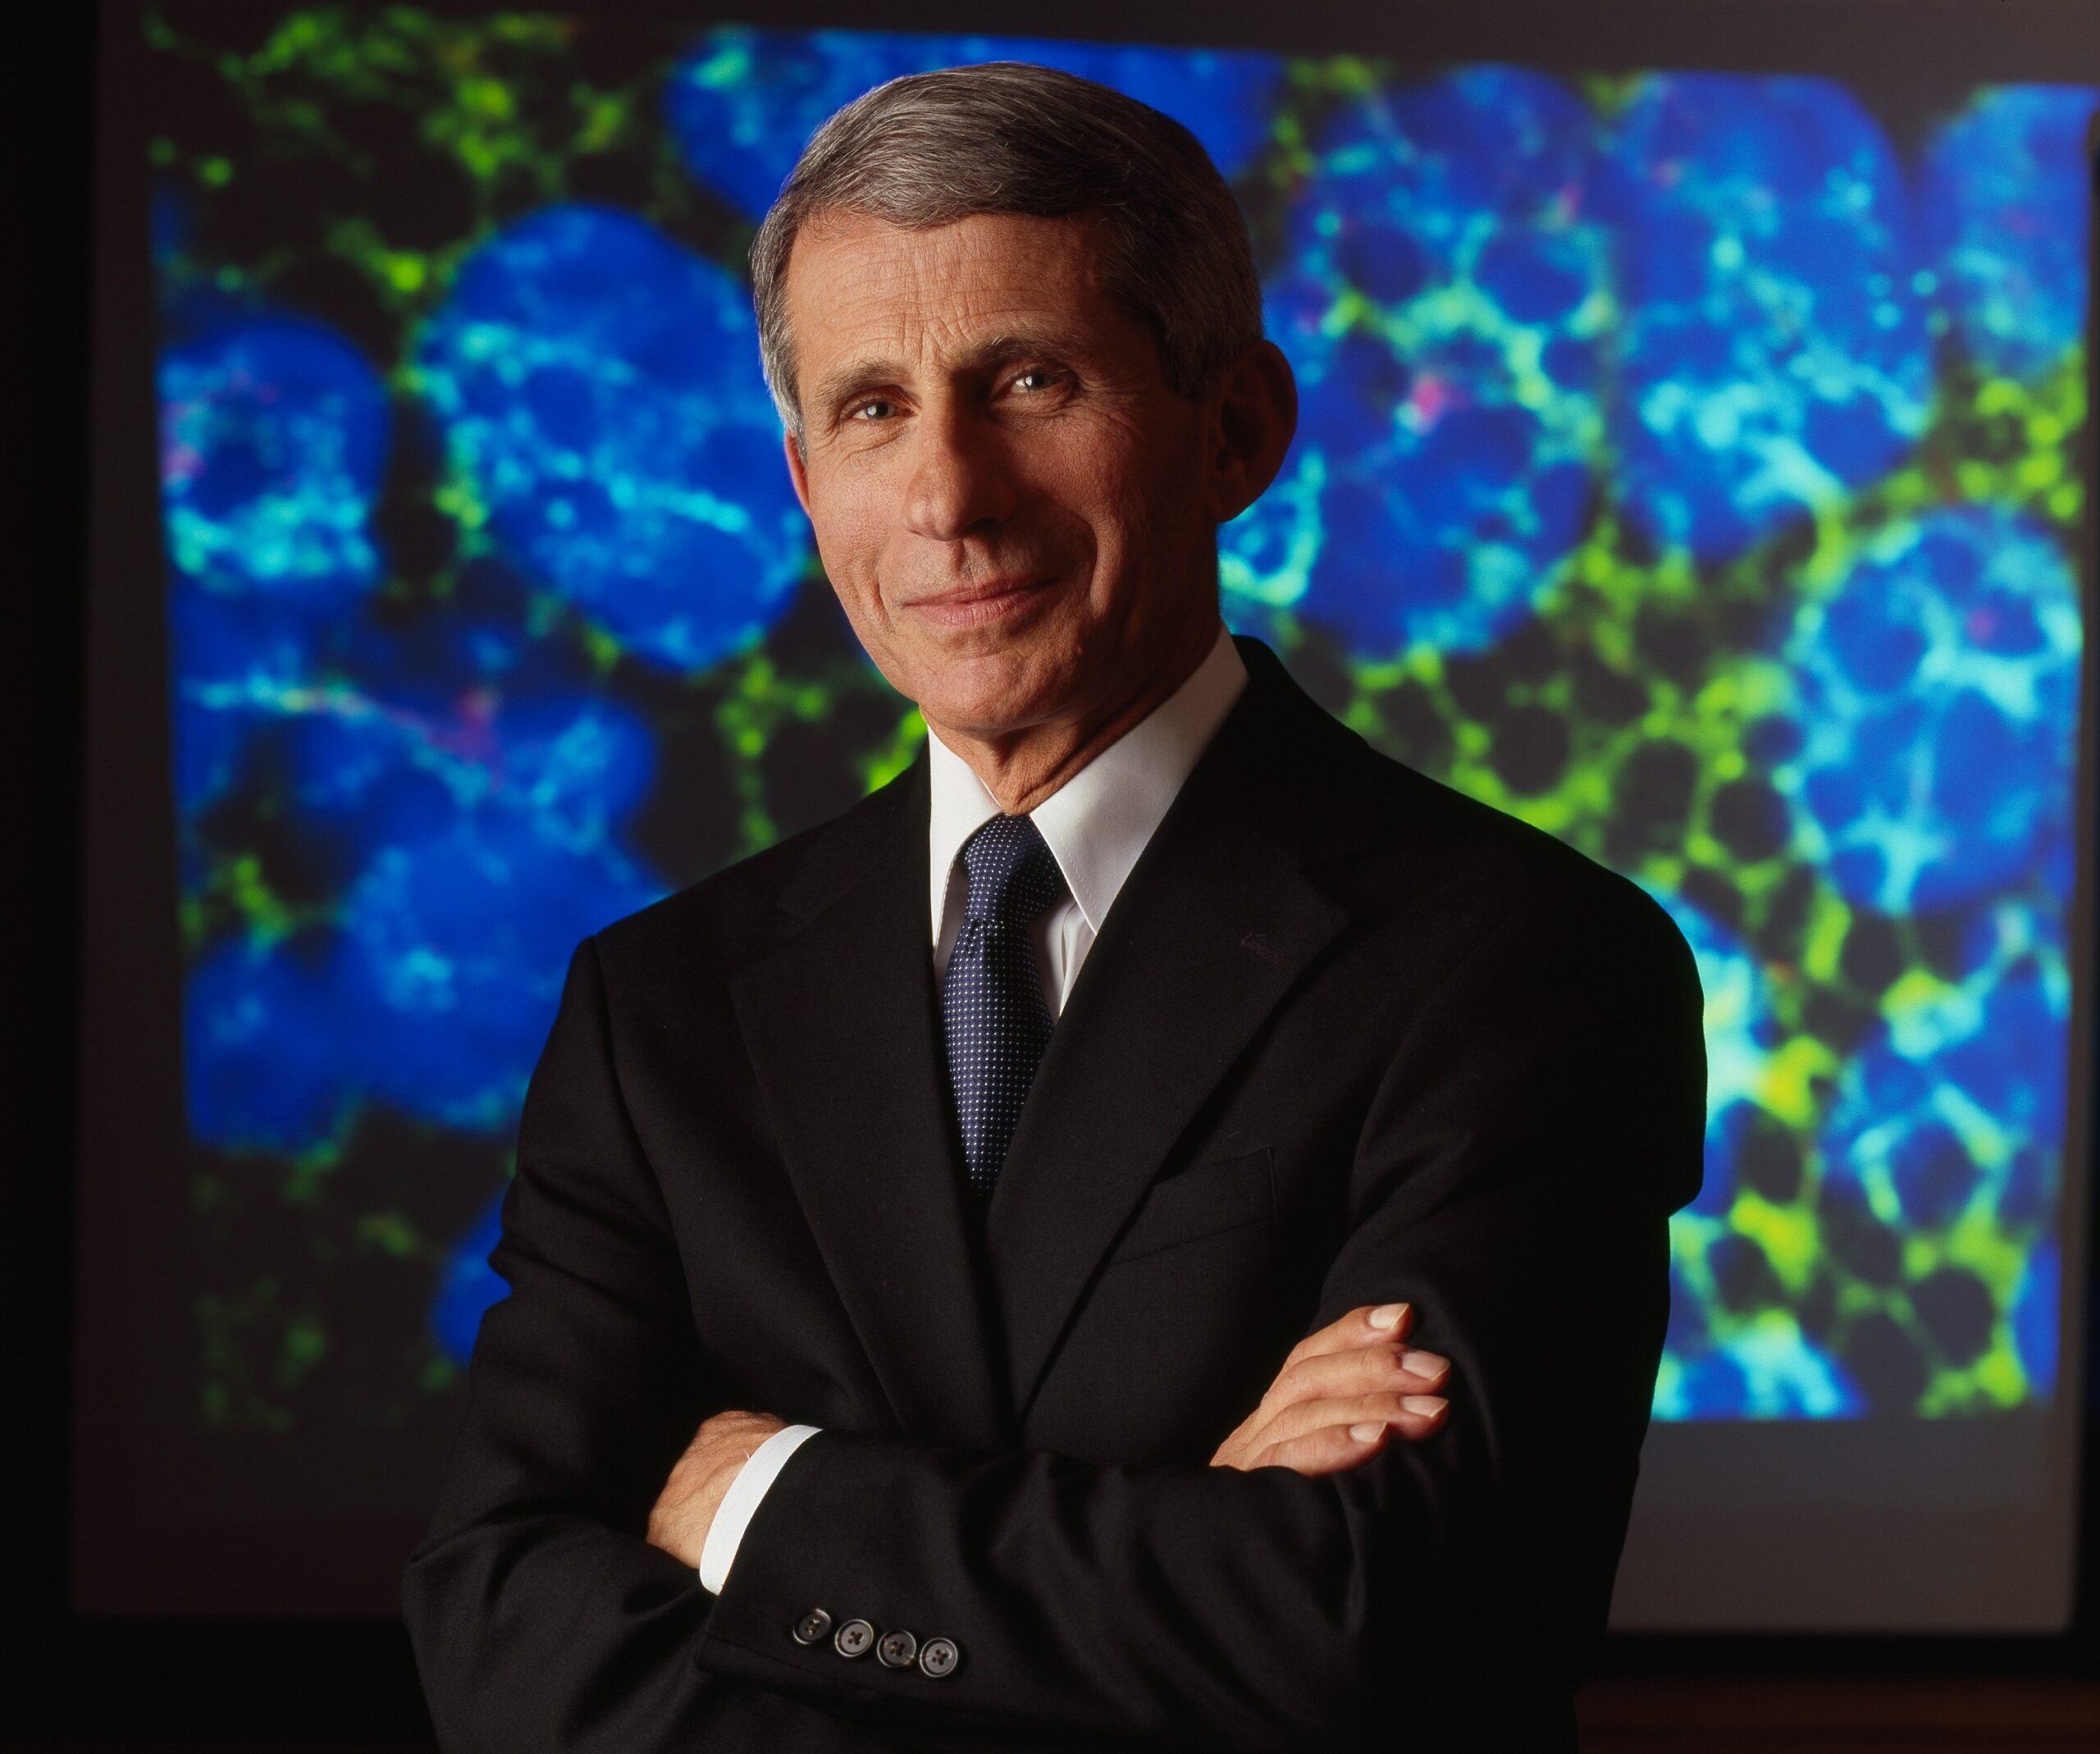 Dr. Anthony Fauci EMEDIA